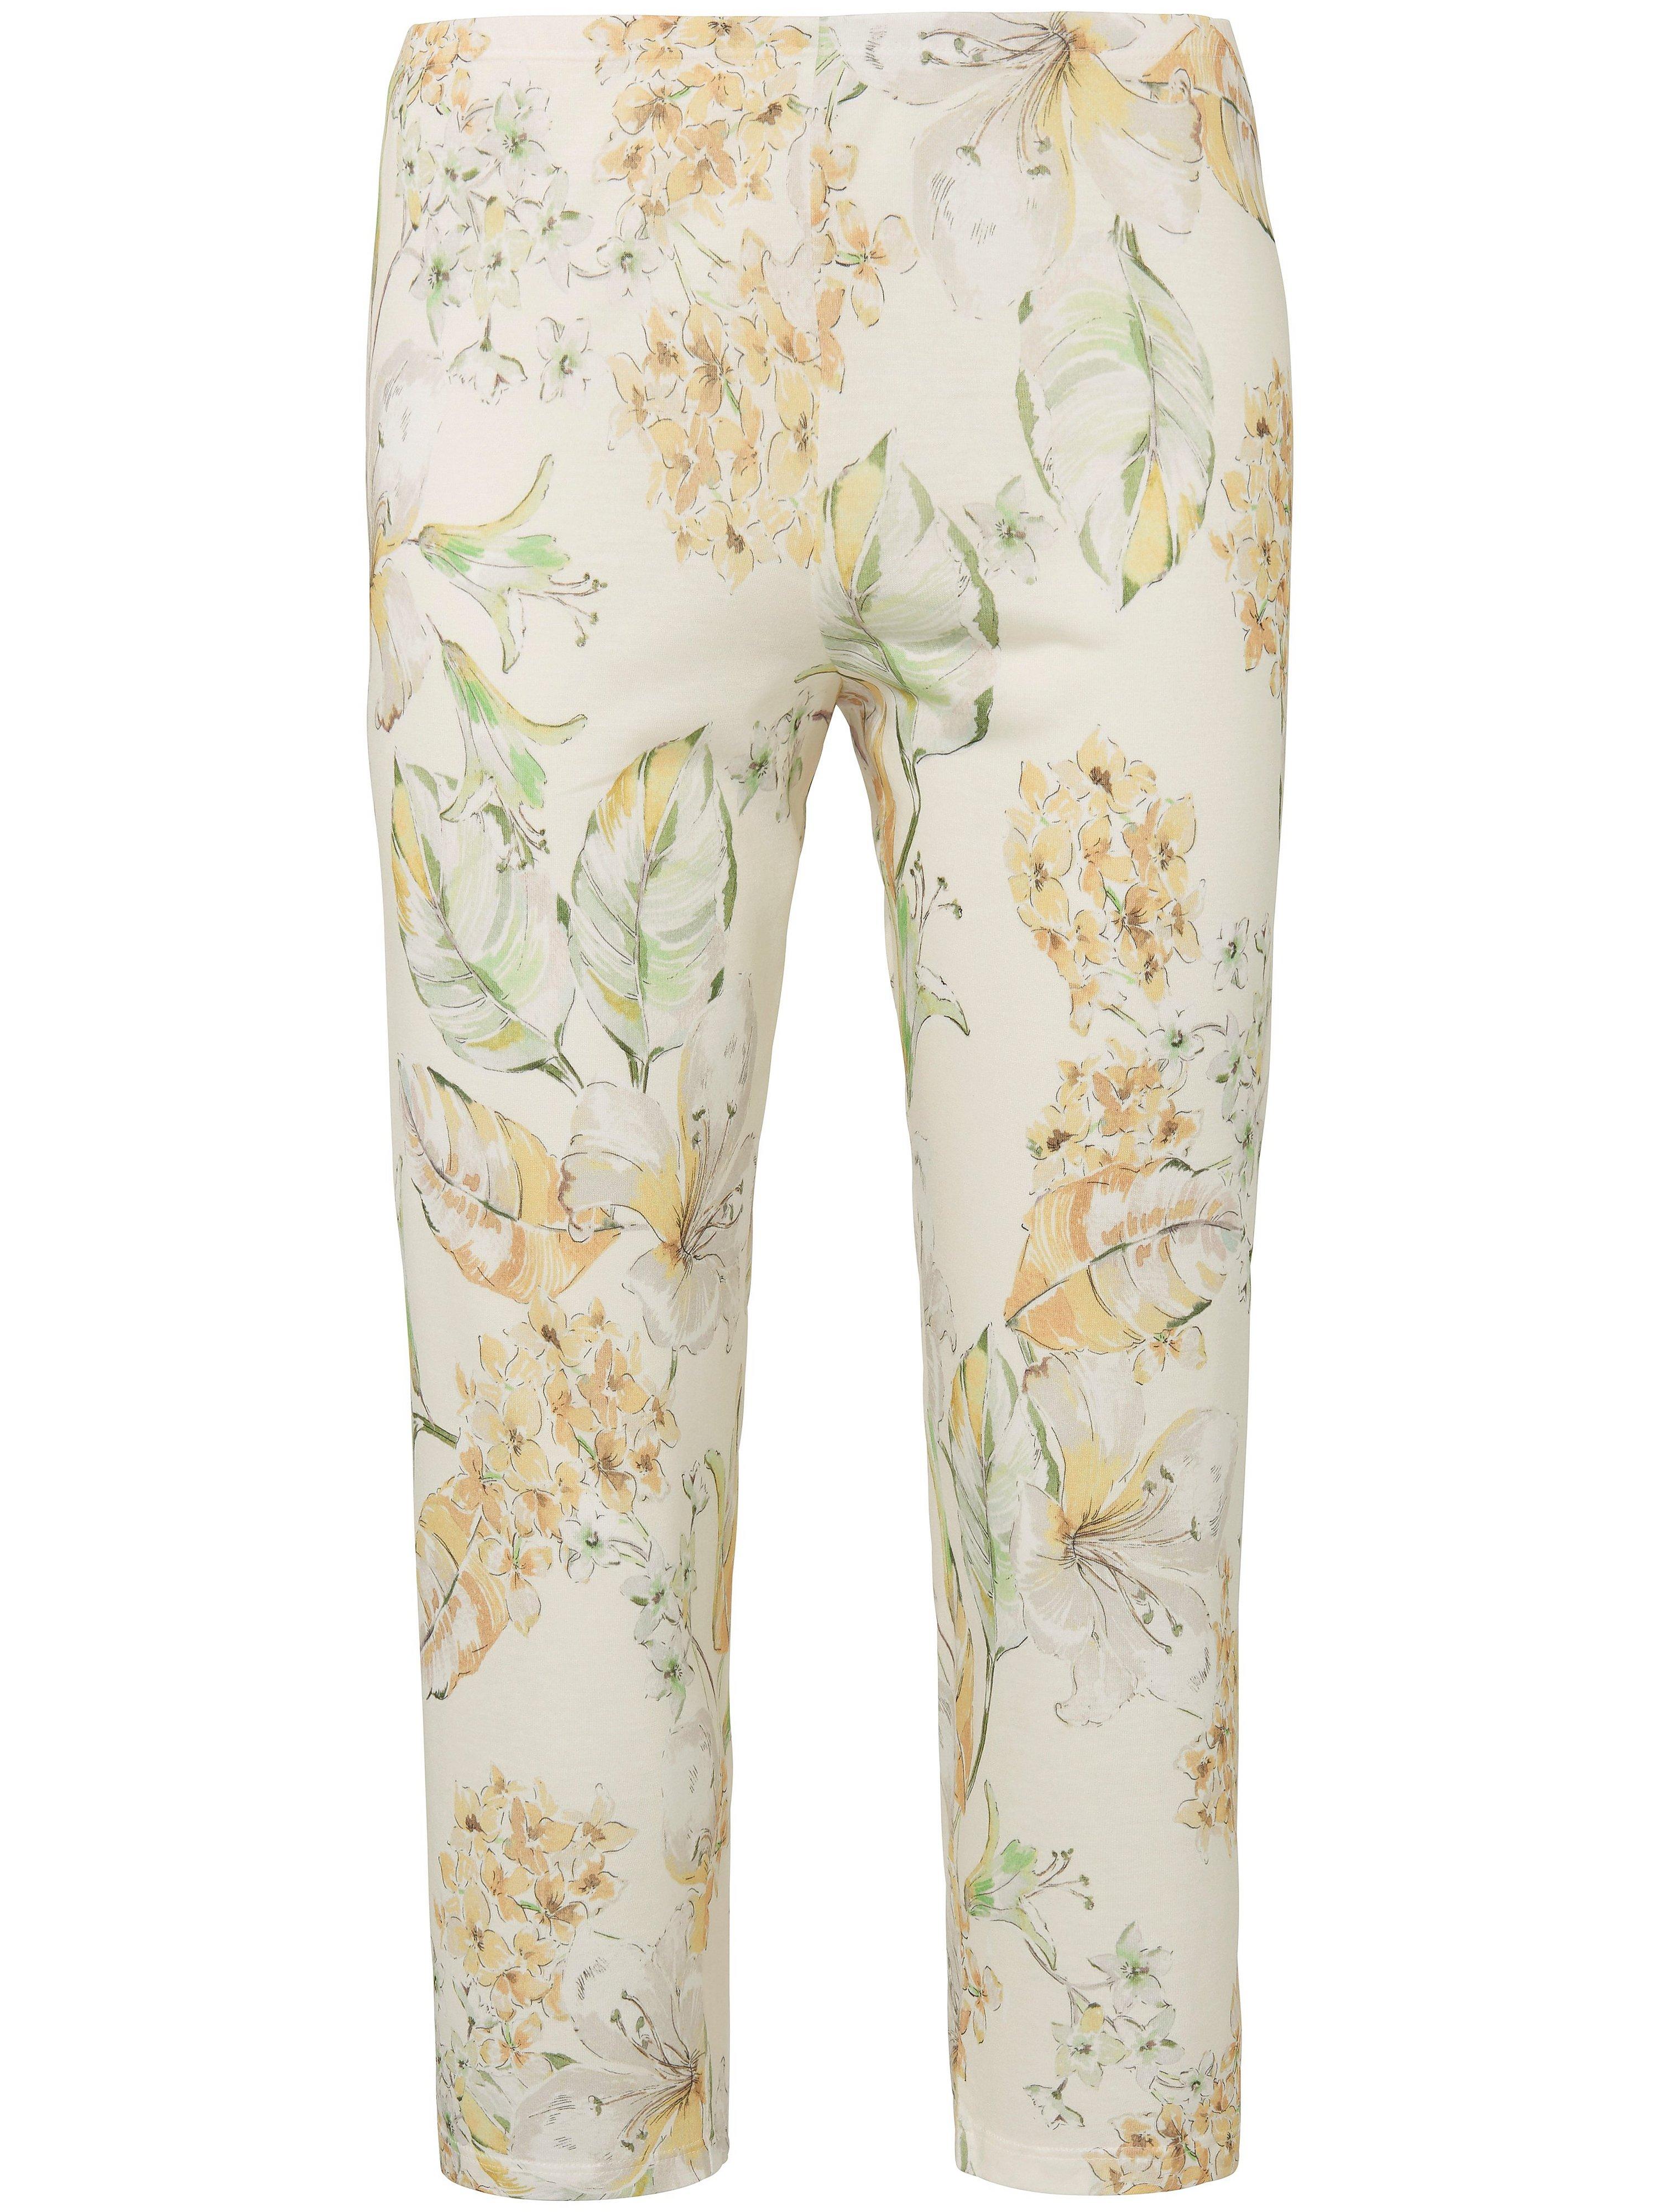 Le pyjama single jersey  Eva B. Bitzer jaune taille 42